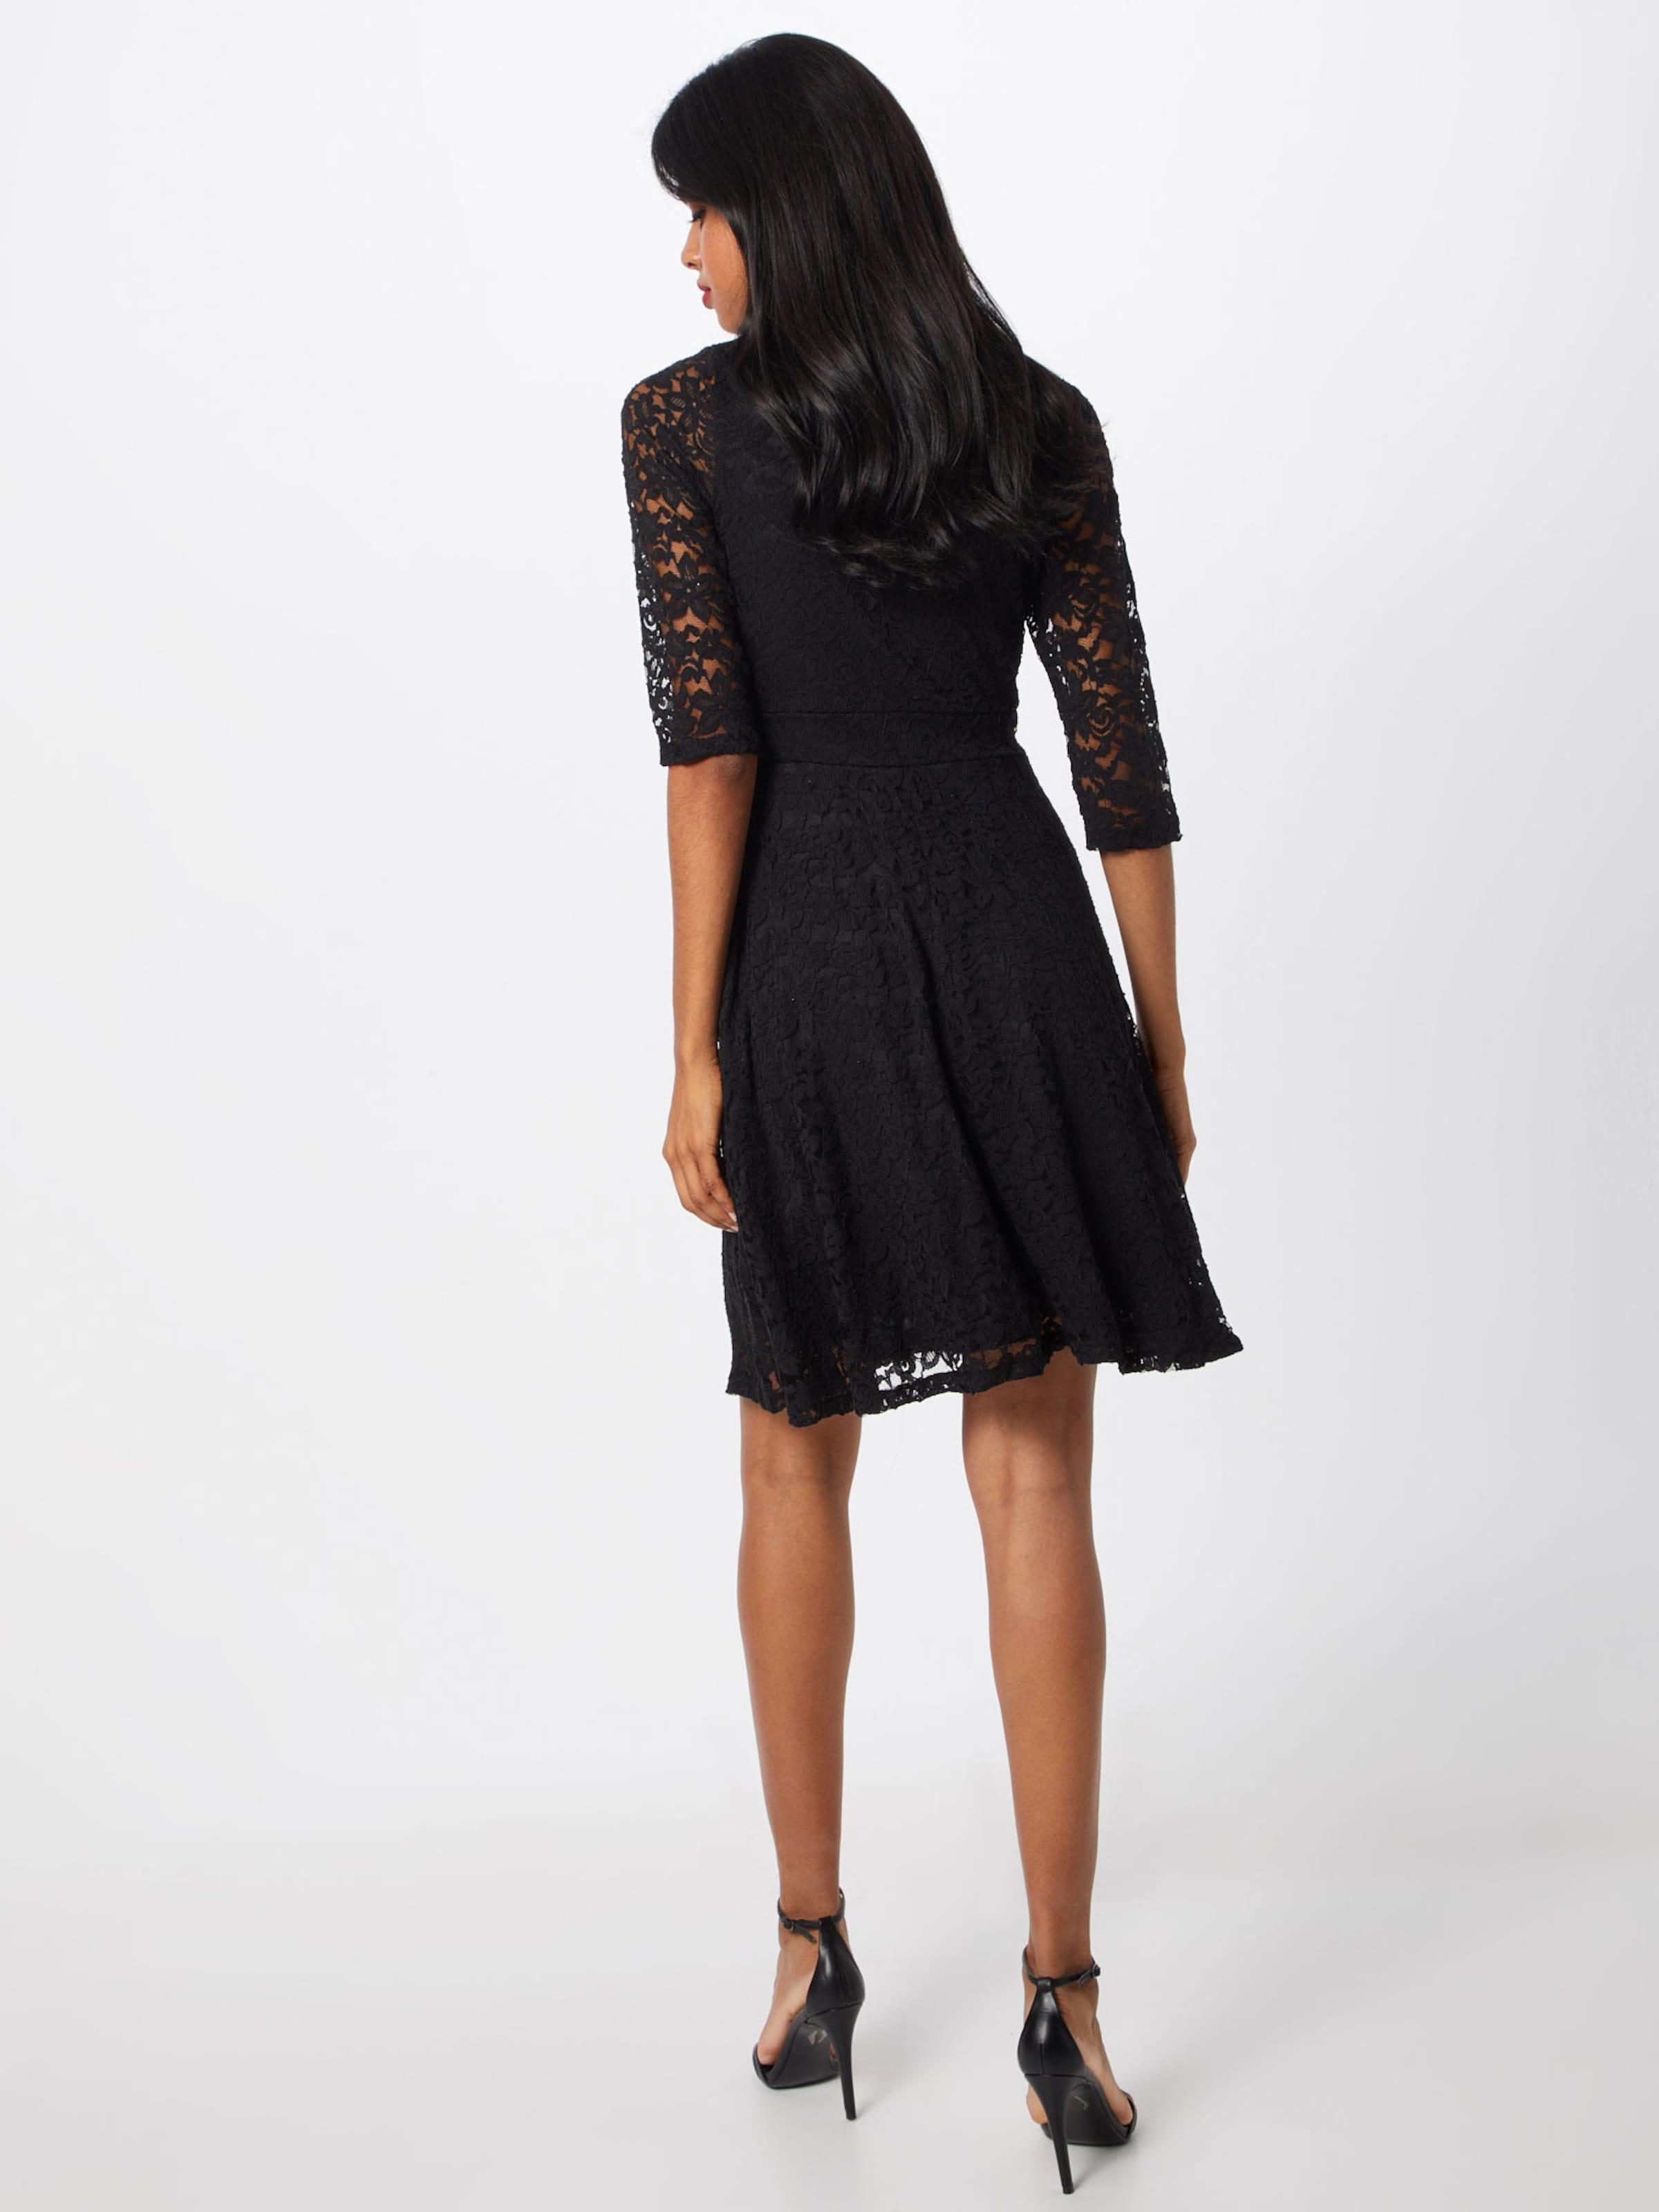 Cocktail Long Noir De Lace London En 'delicate Dress' Mela Sleeve Robe BxedCo